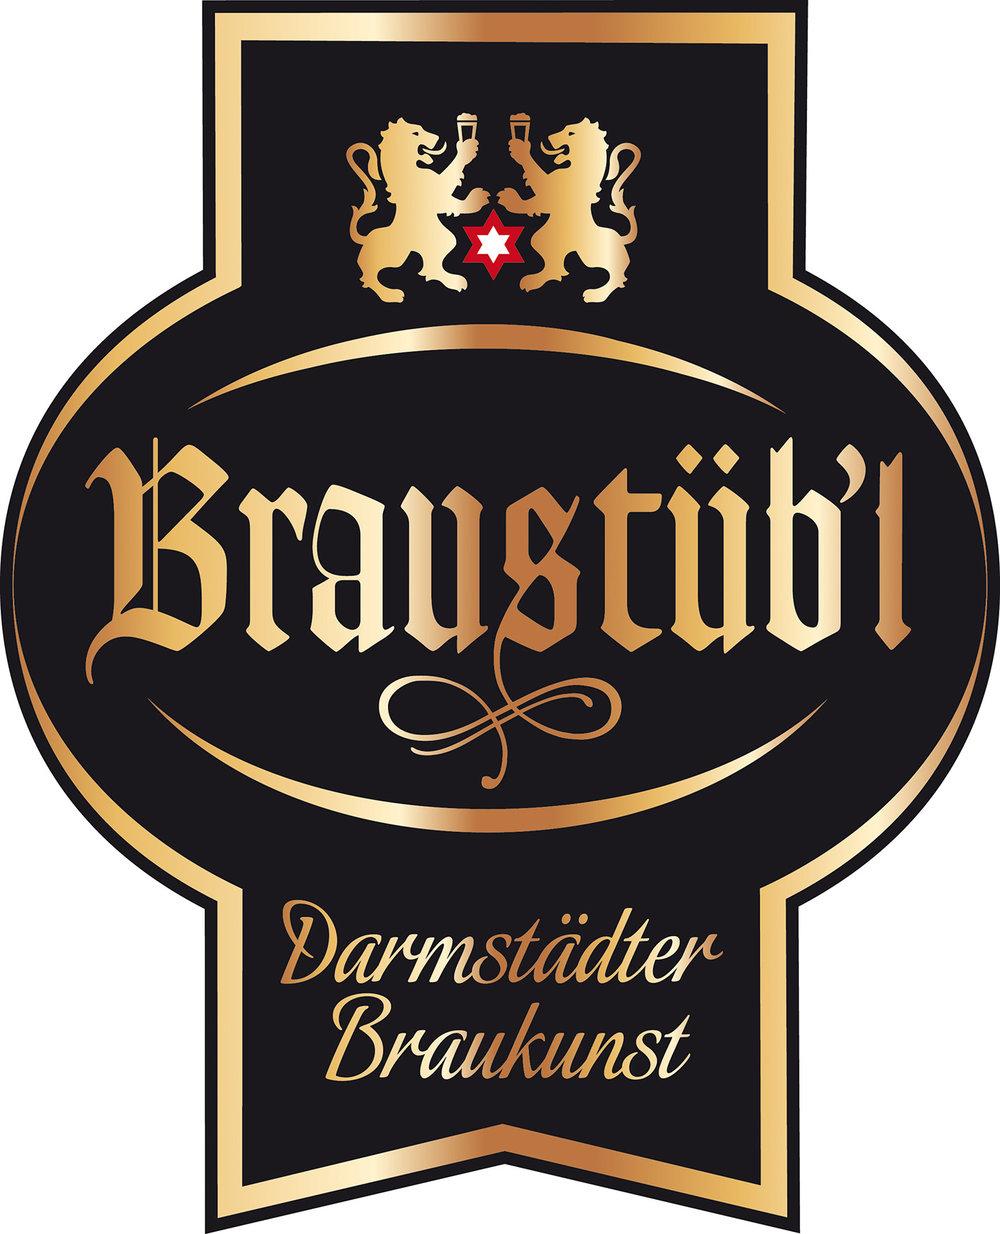 Braustuebl_Logo_Braukunst.jpg